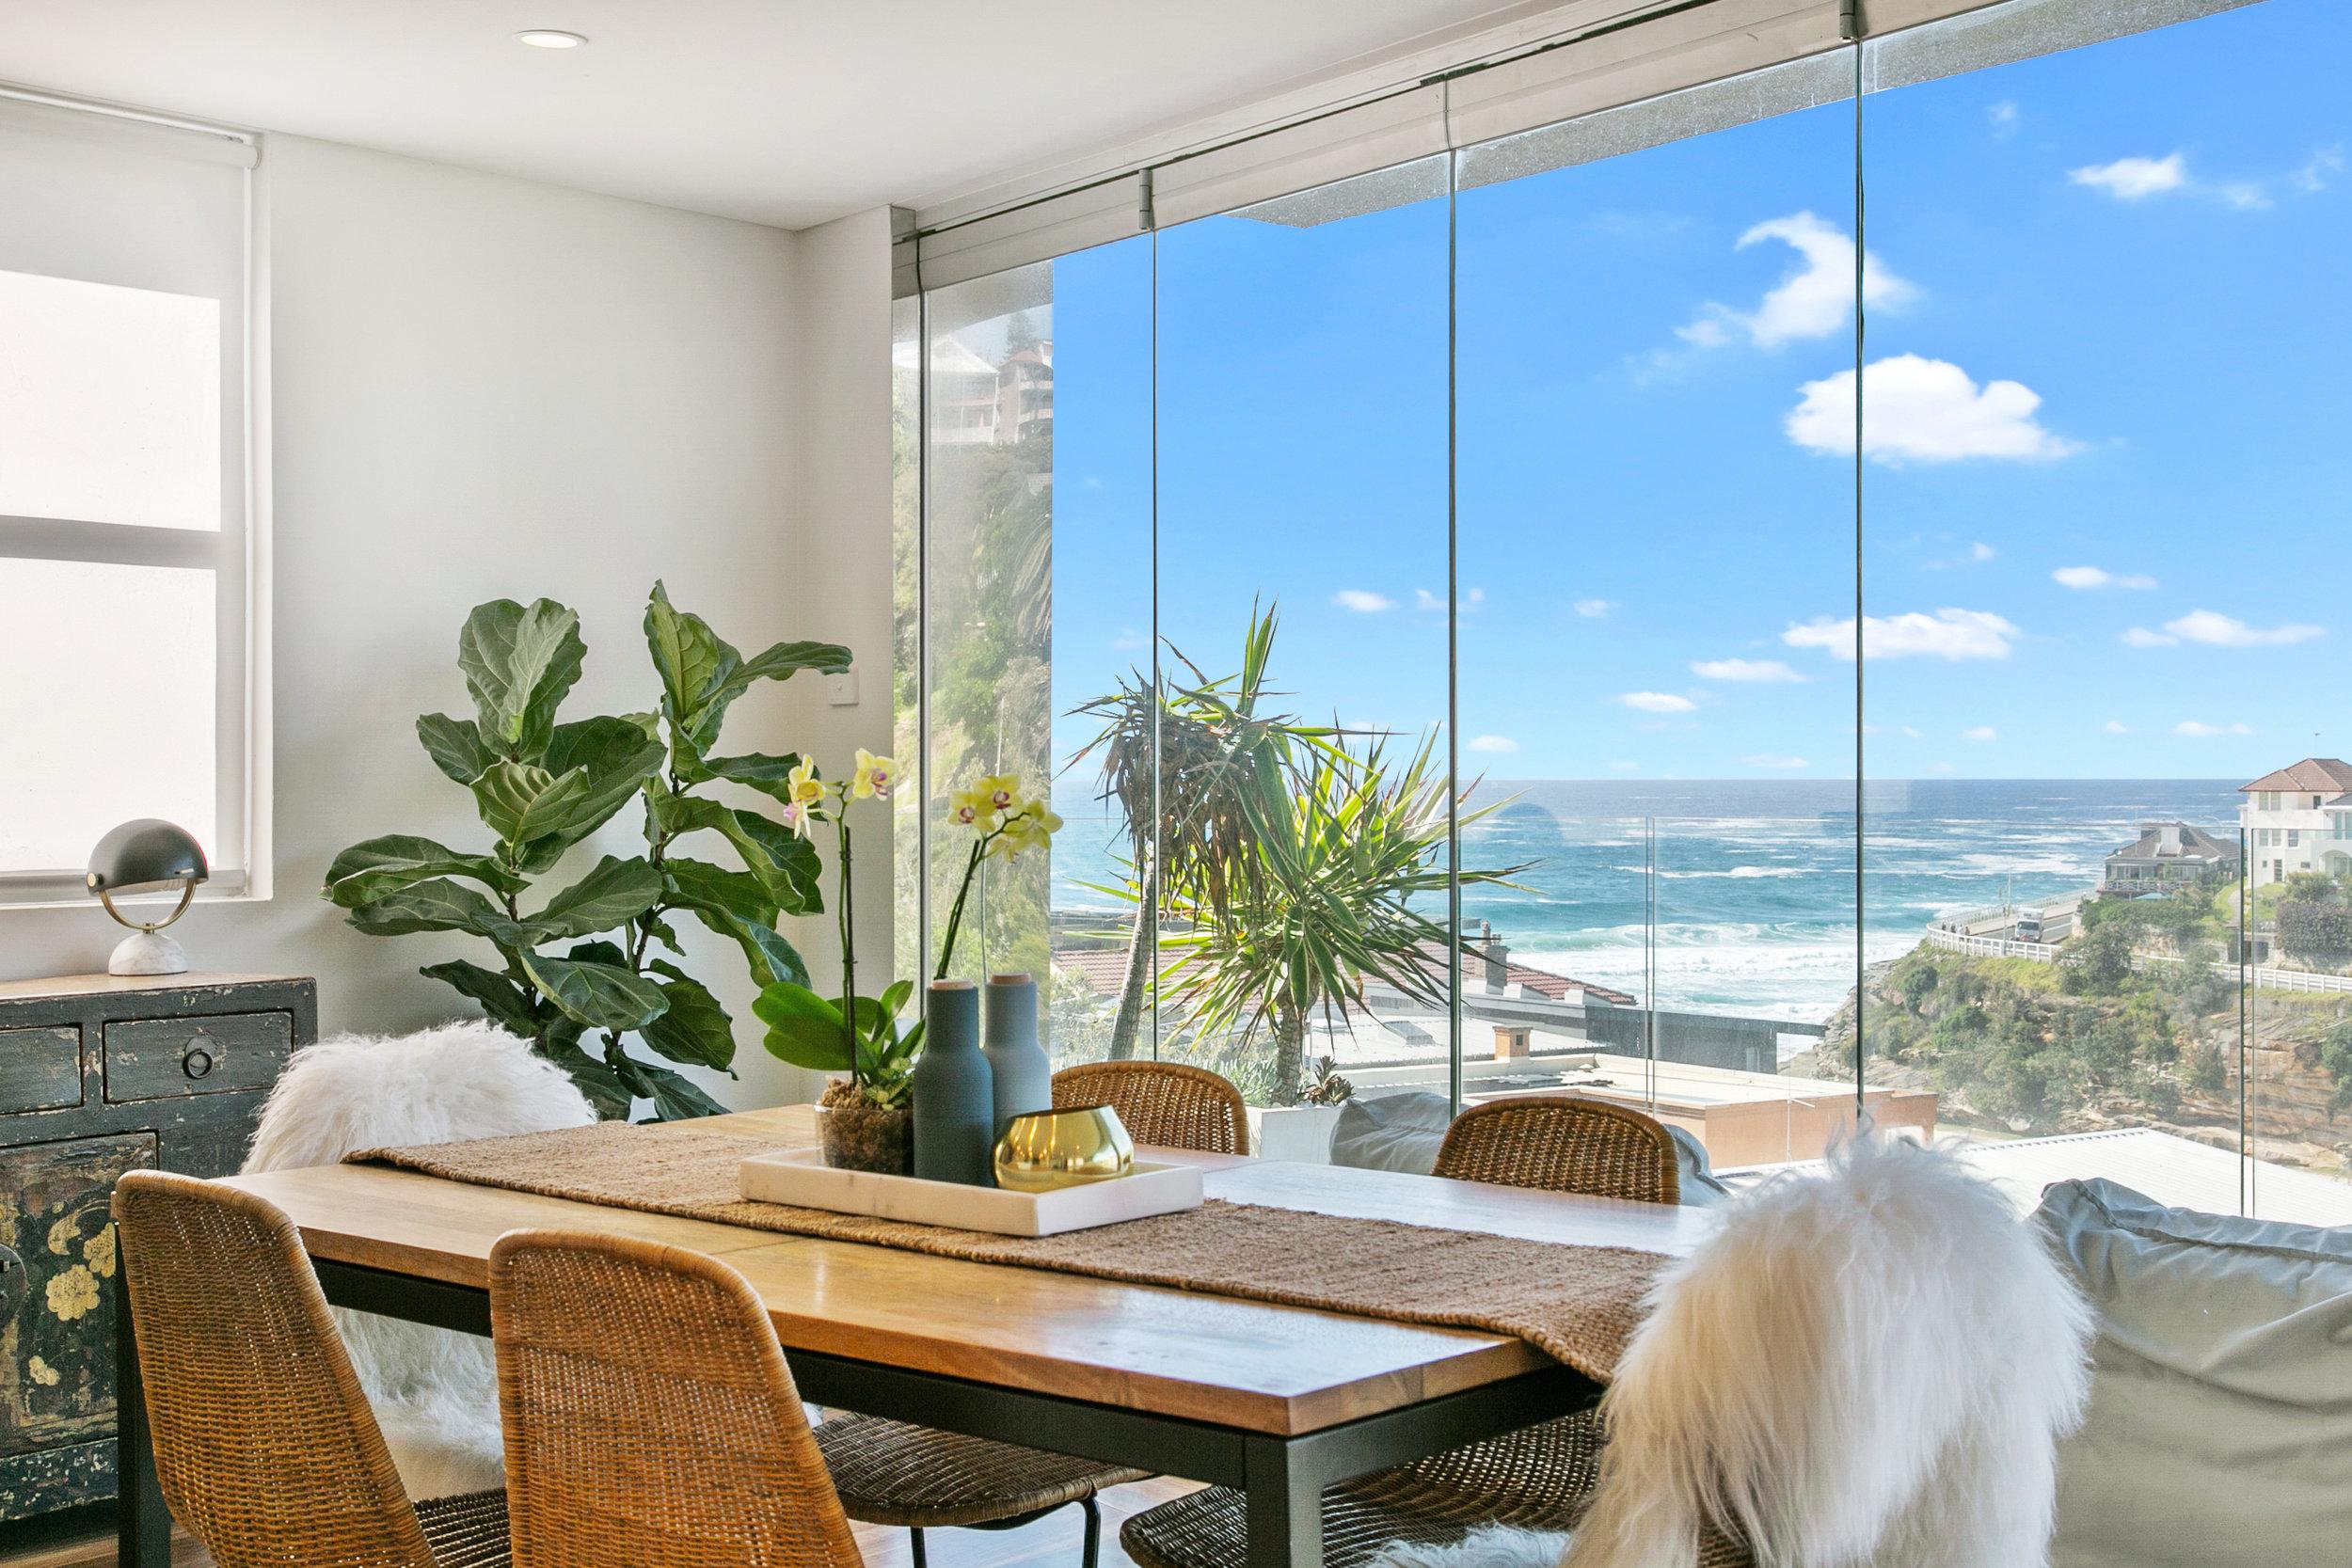 The Penthouse Tamarama ocean view. Bondi Beach Holiday Homes2.jpg